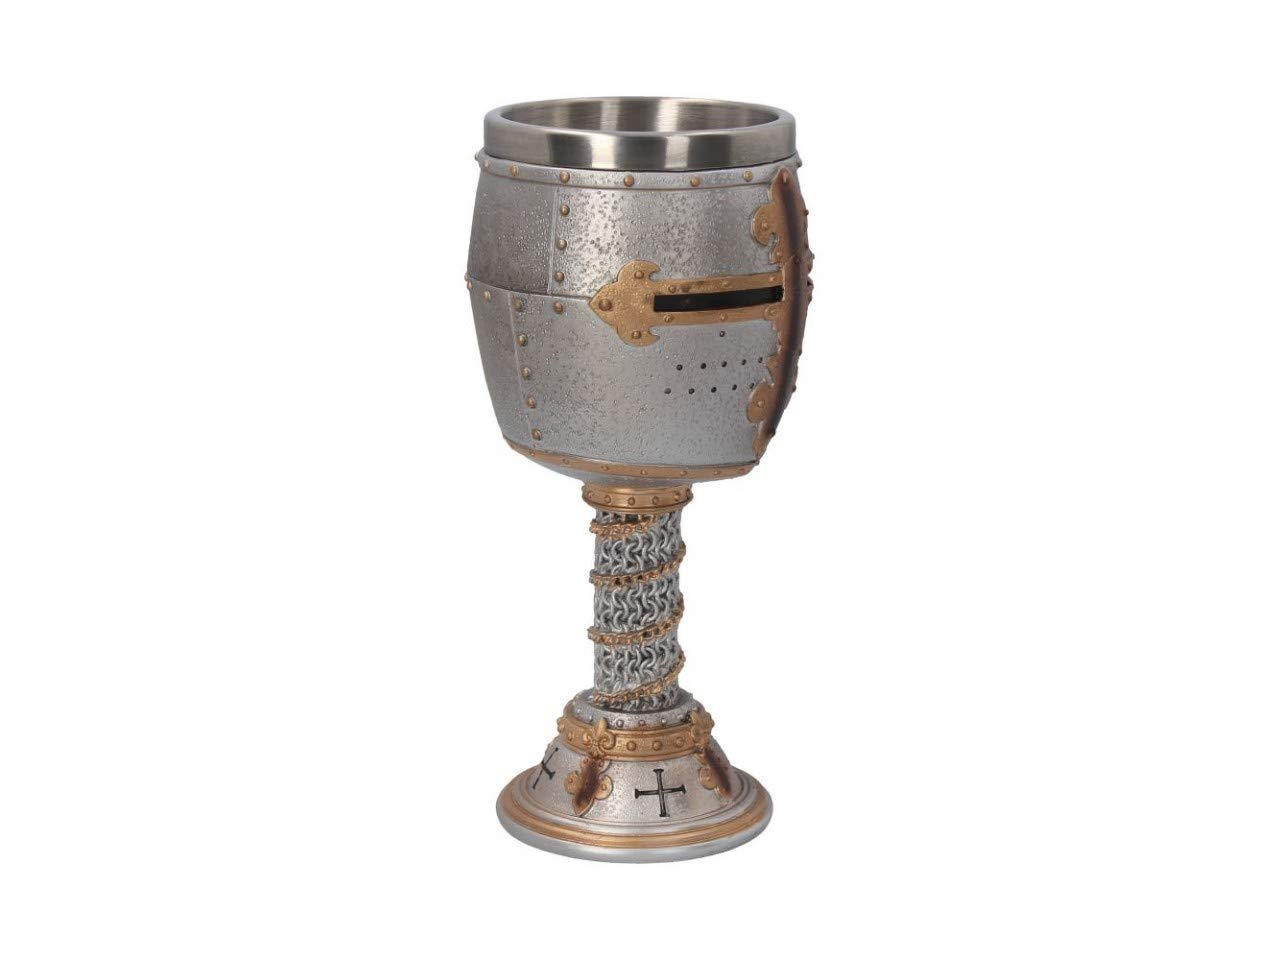 Copa de Vino 18 cm, Resina, Inserto de Acero Inoxidable Nemesis Now Crusader Color Plateado